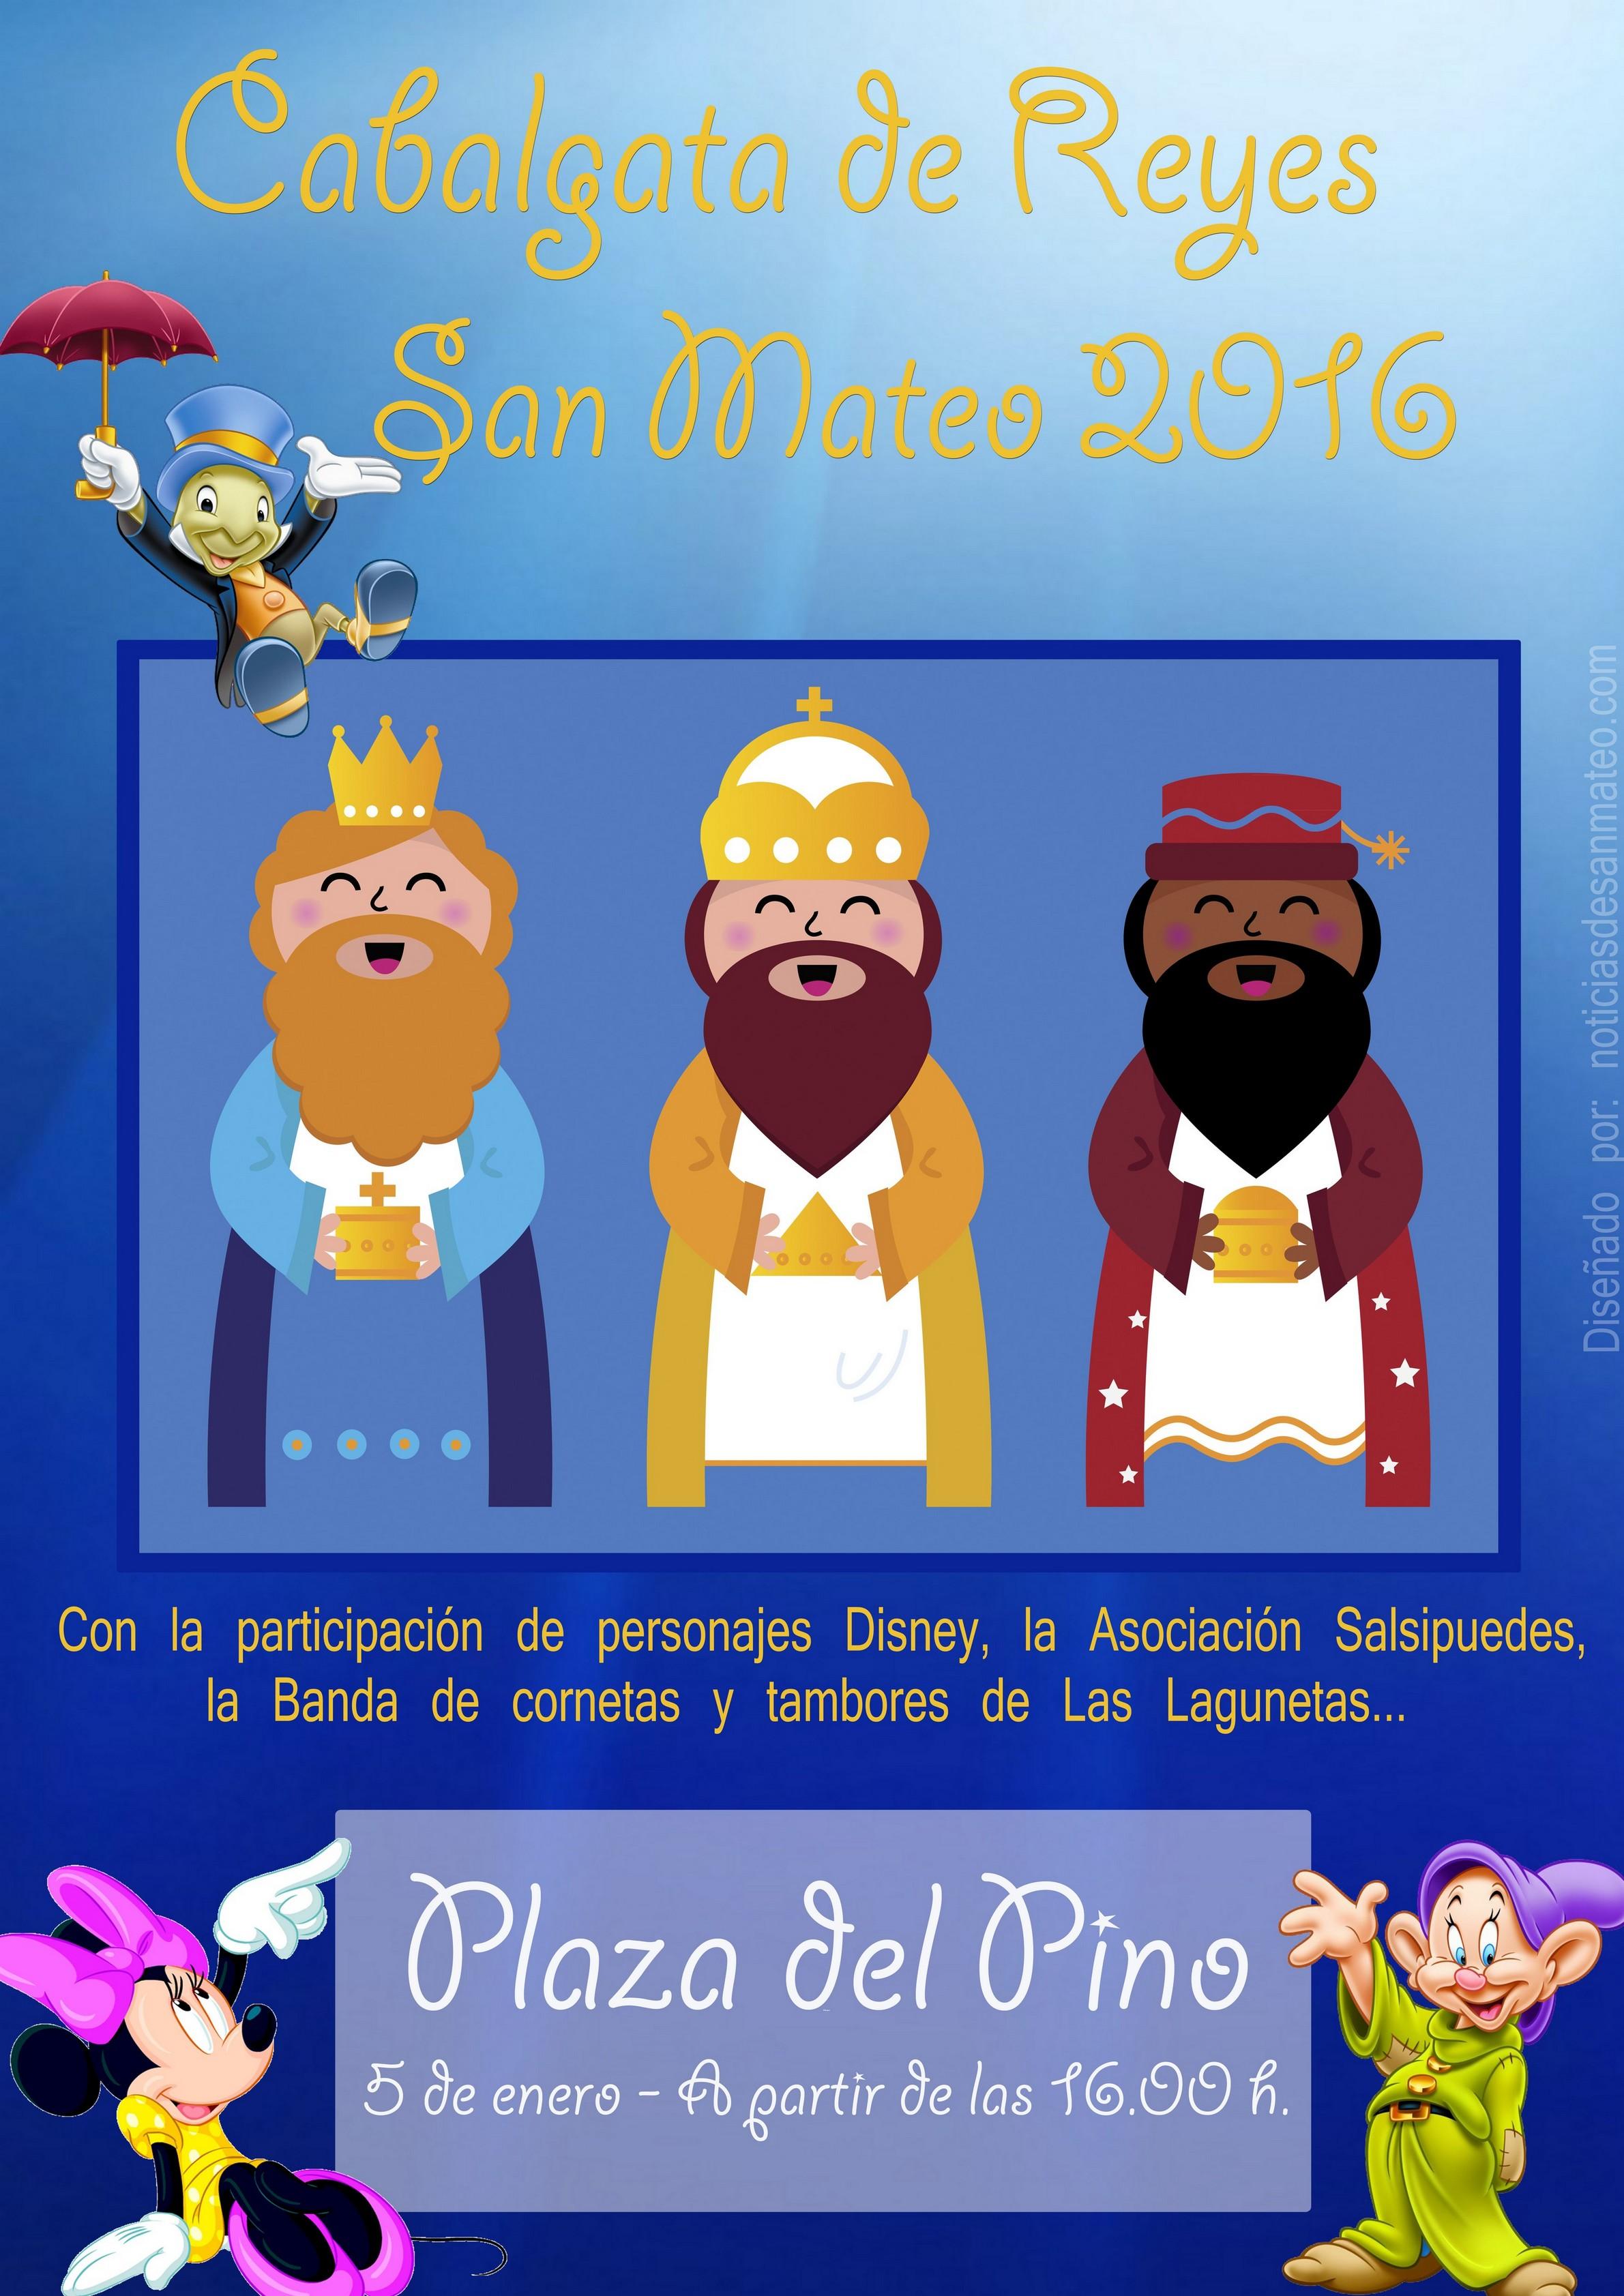 Cabalgata_Reyes_2016_-2-.jpg